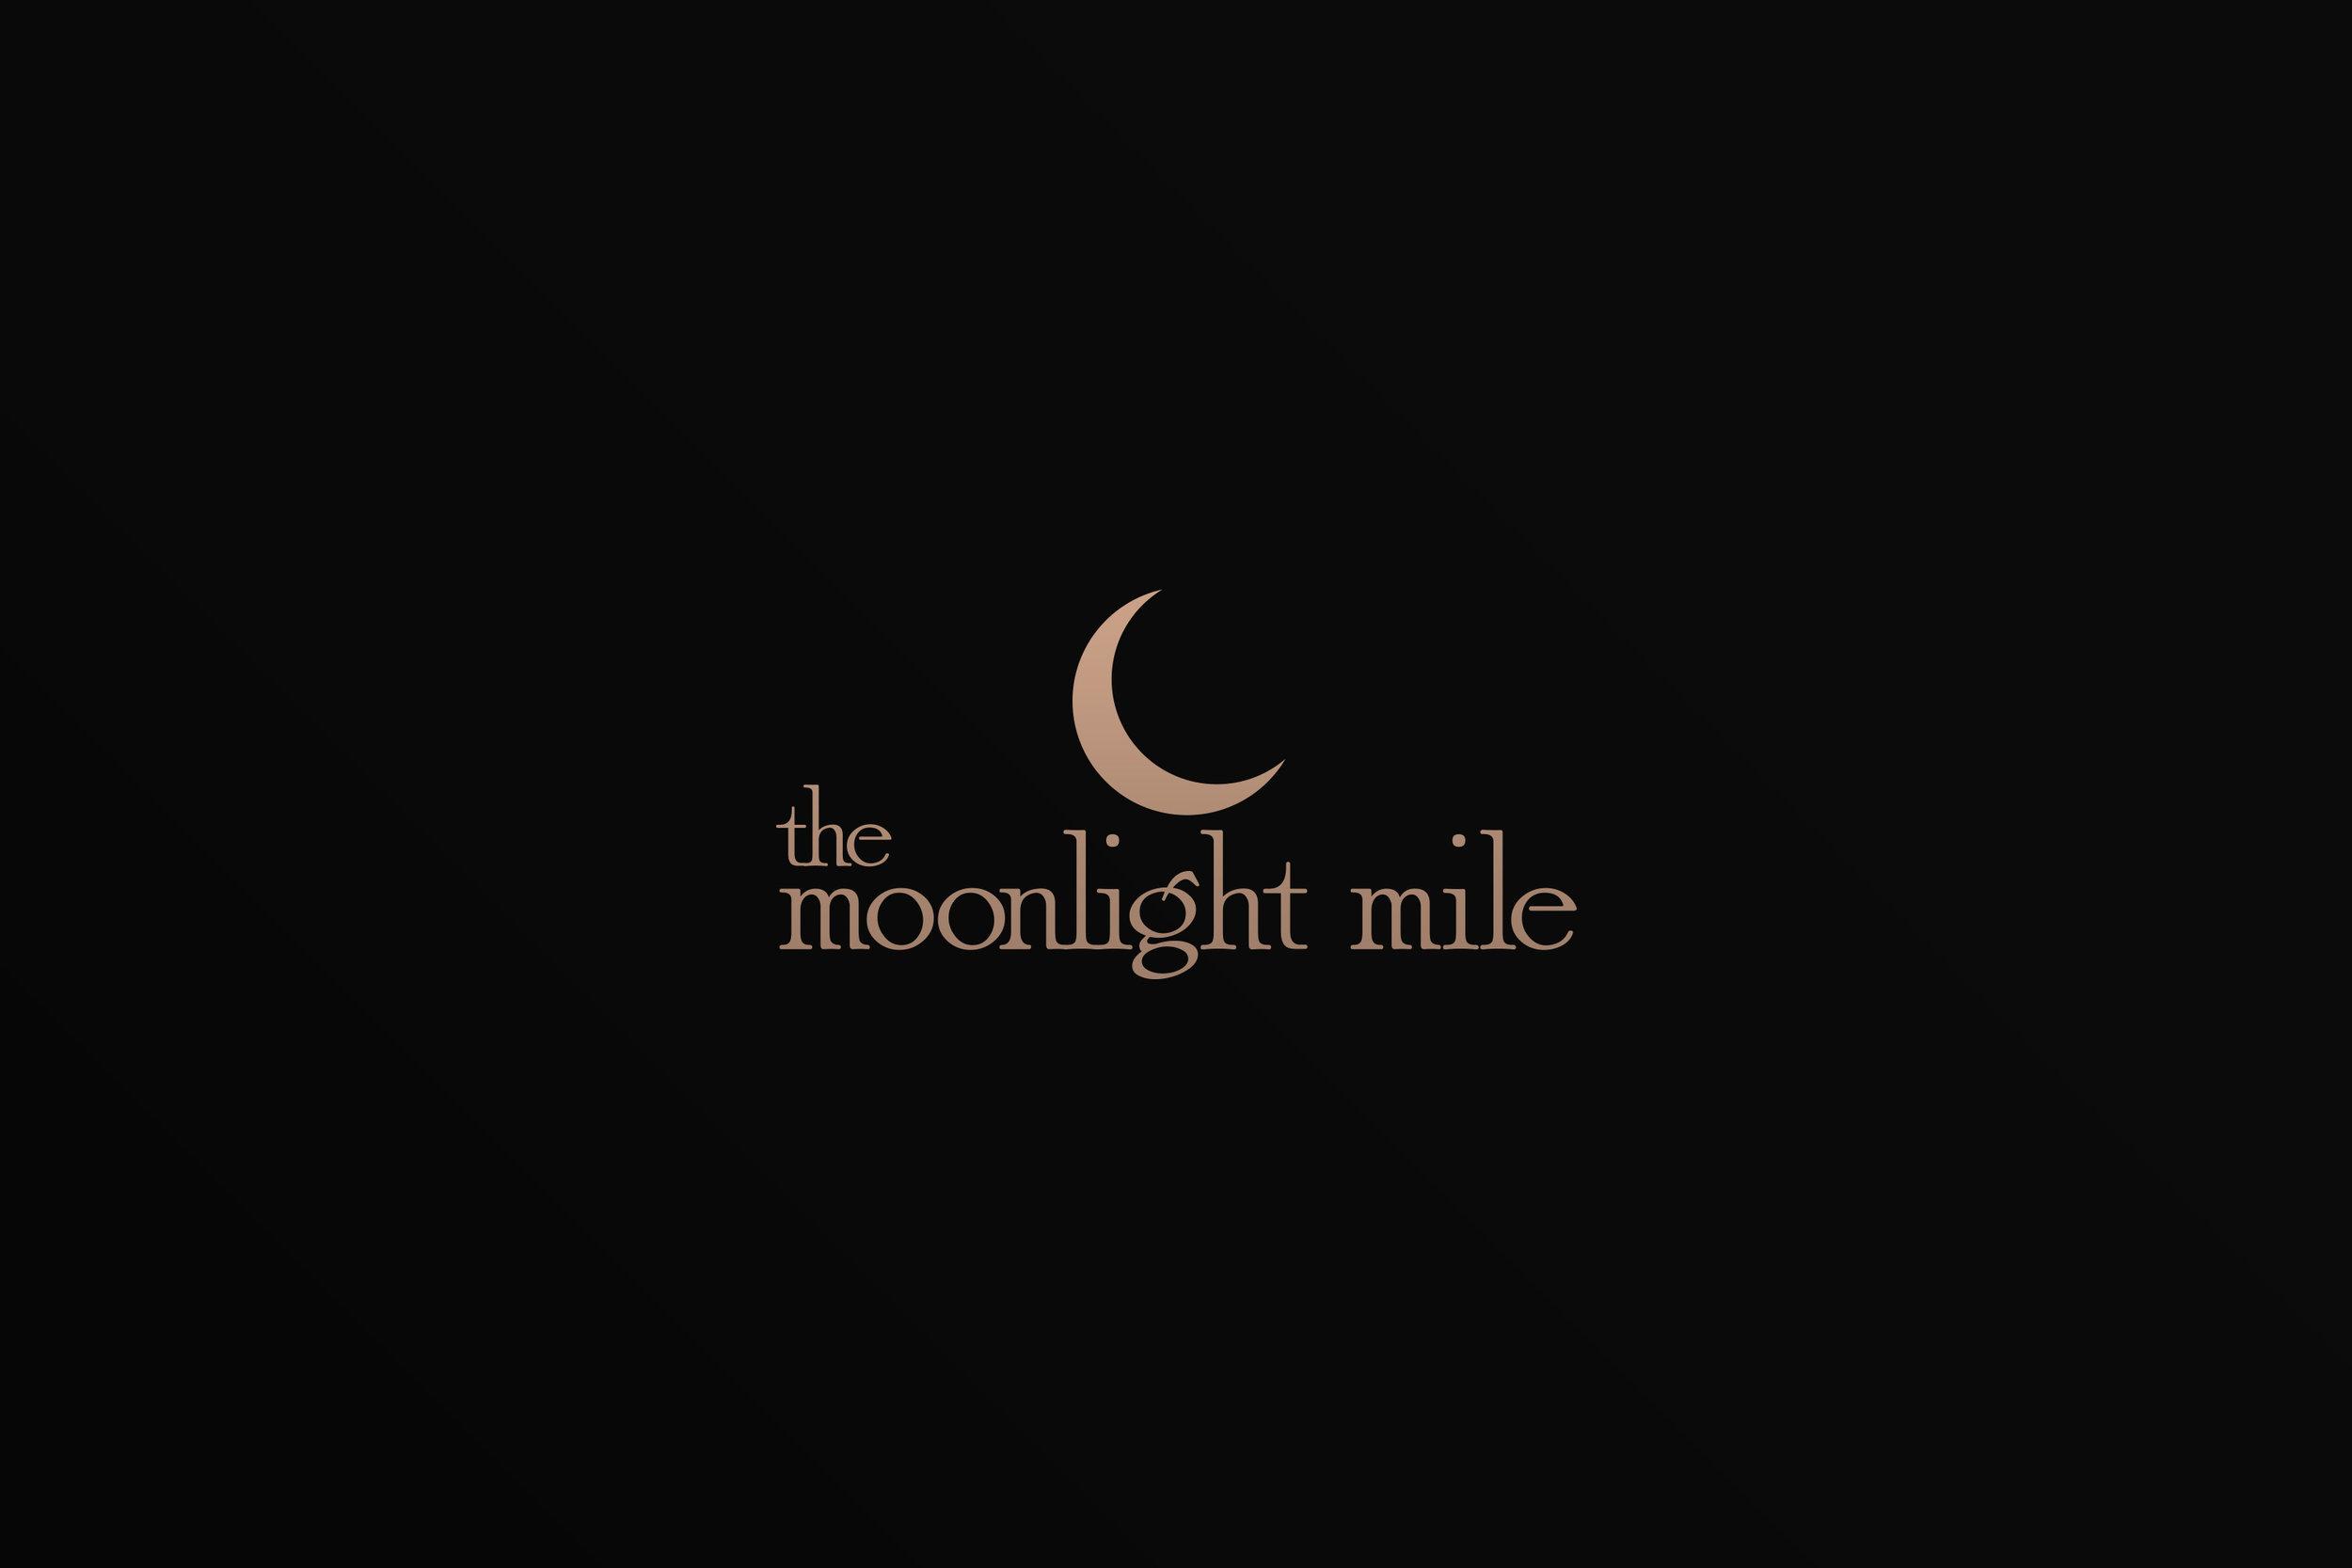 Studio_Bloq-The_Moonlight_Mile-2.jpg